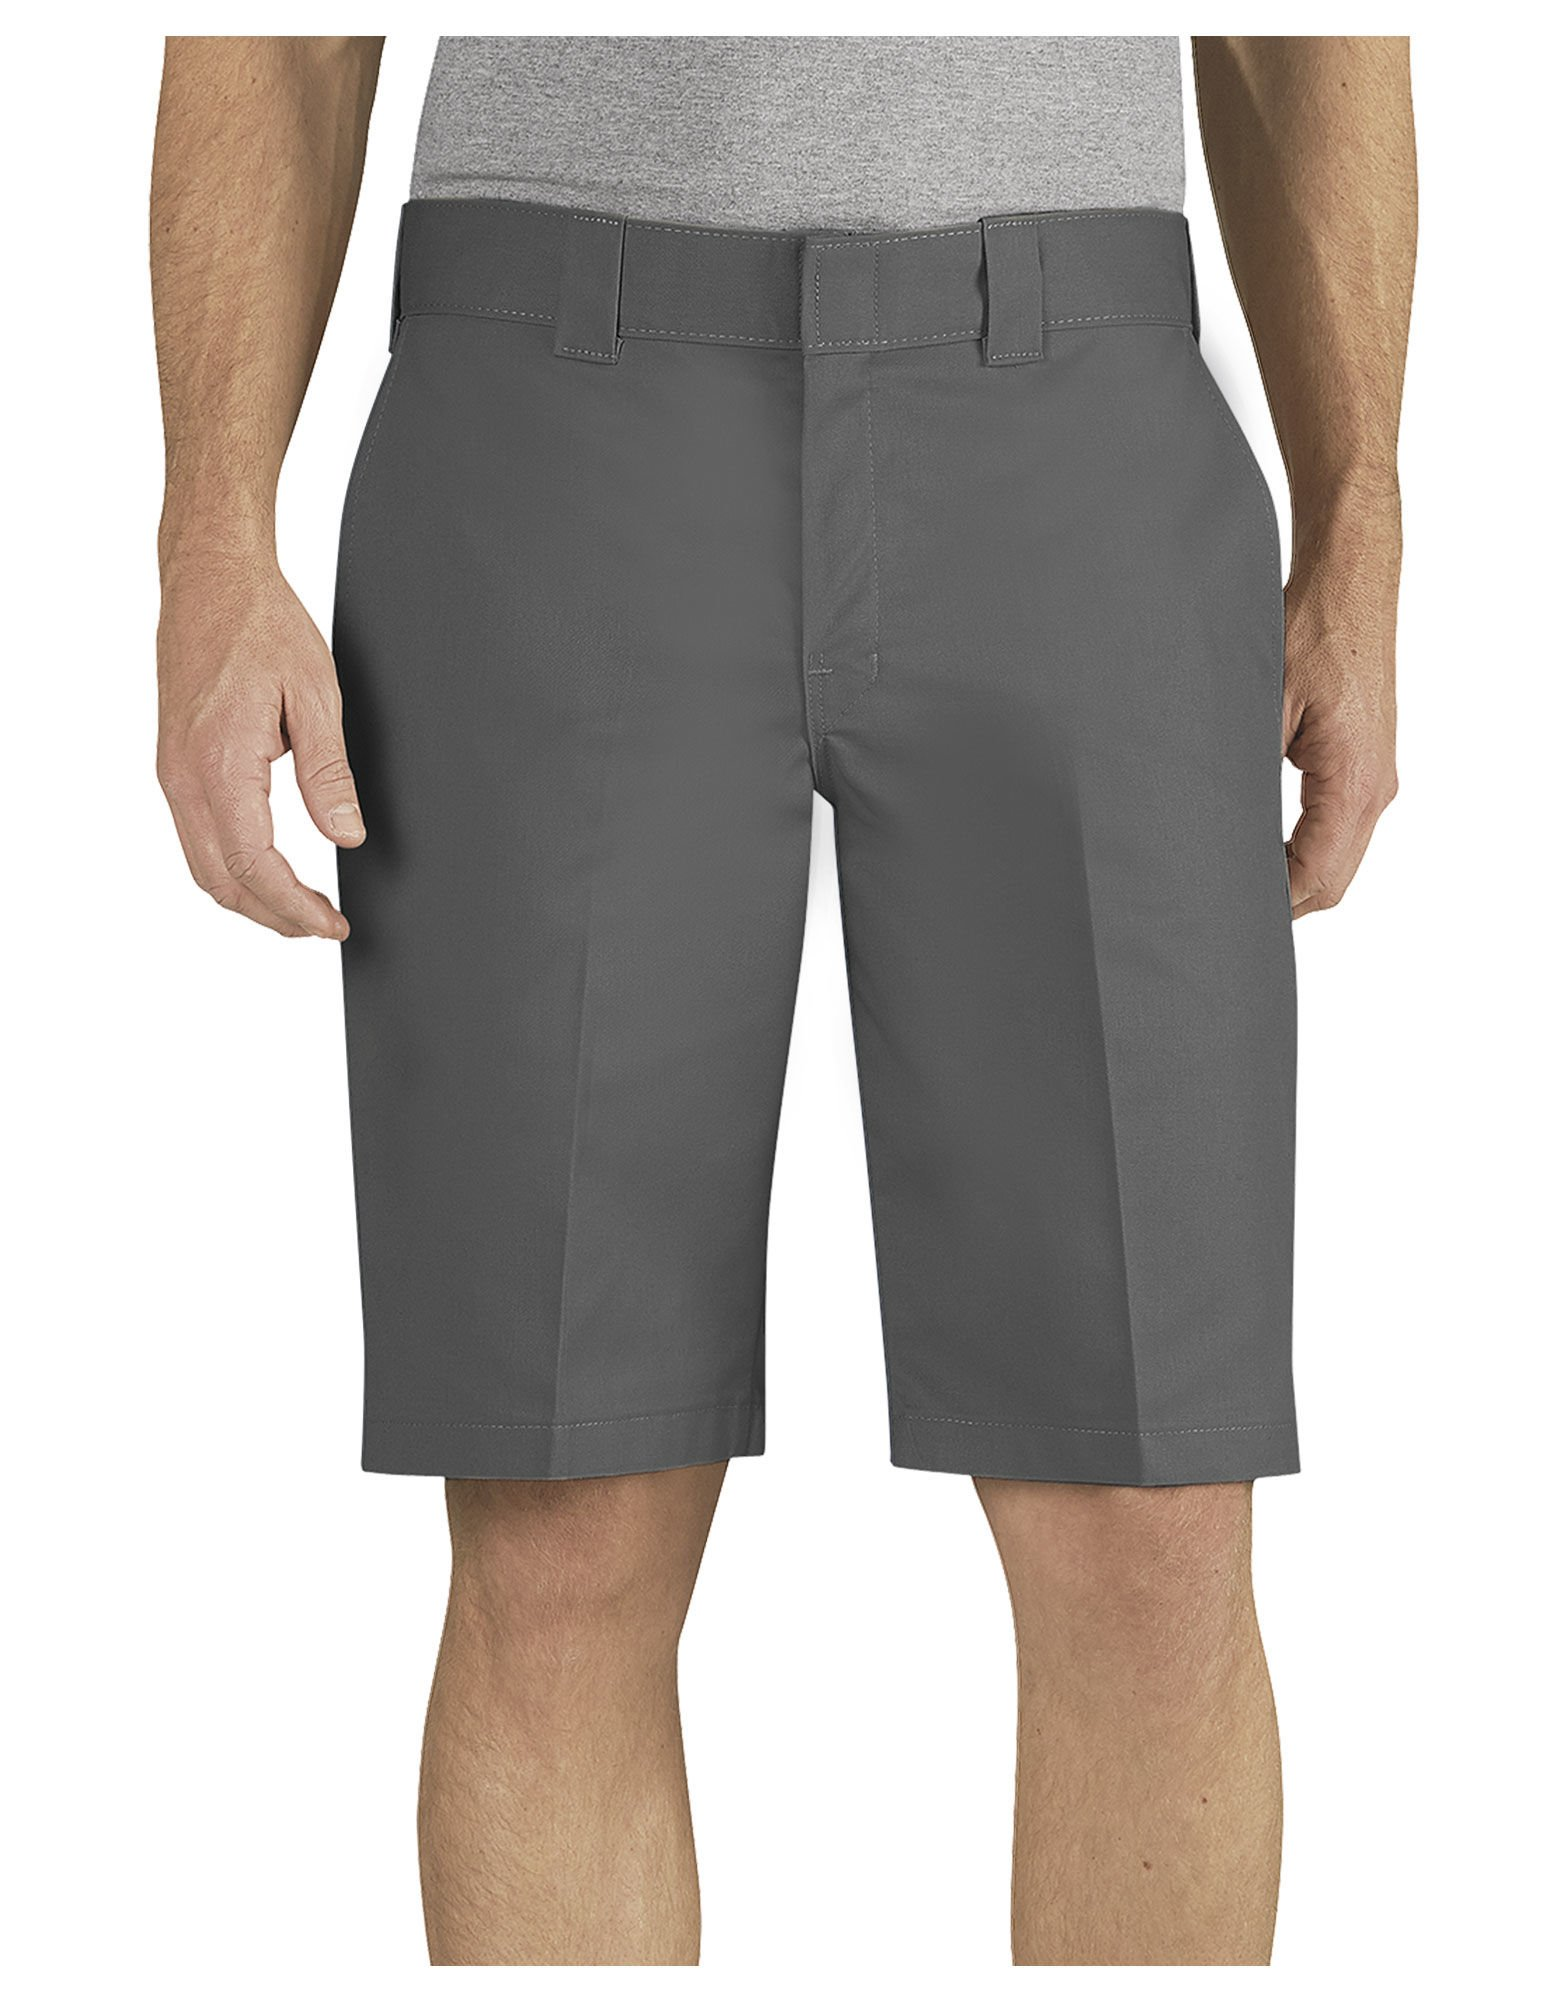 Dickies Men's Flex 11'' Relaxed Fit Wrinkle Resistant Work Shorts, Gravel Gray, 48 by Dickies